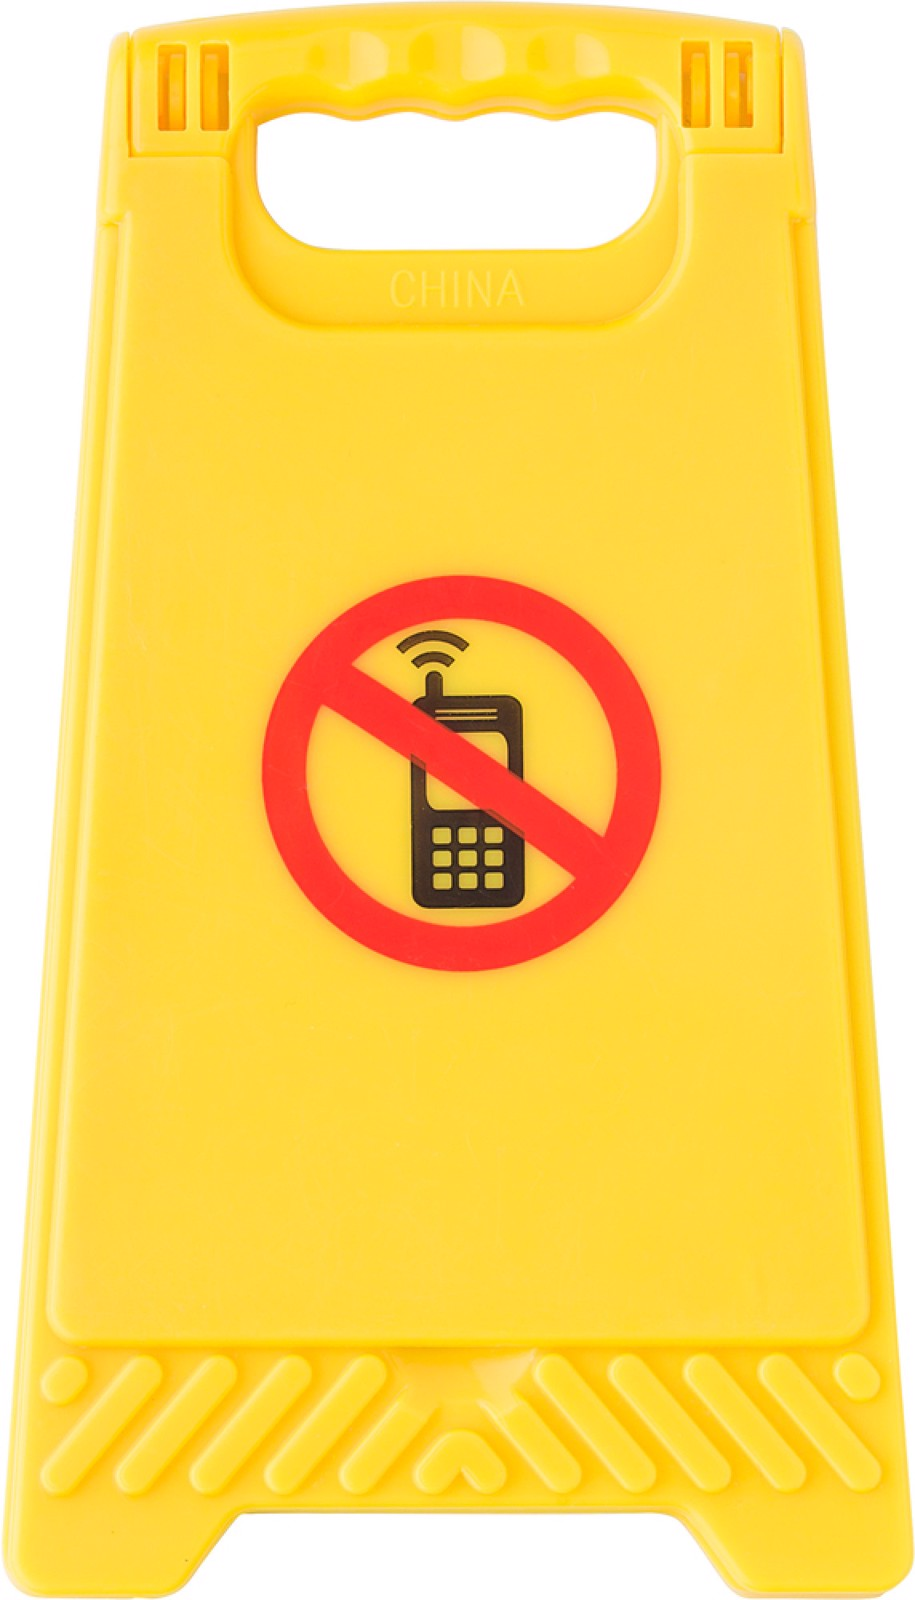 ABS warning sign